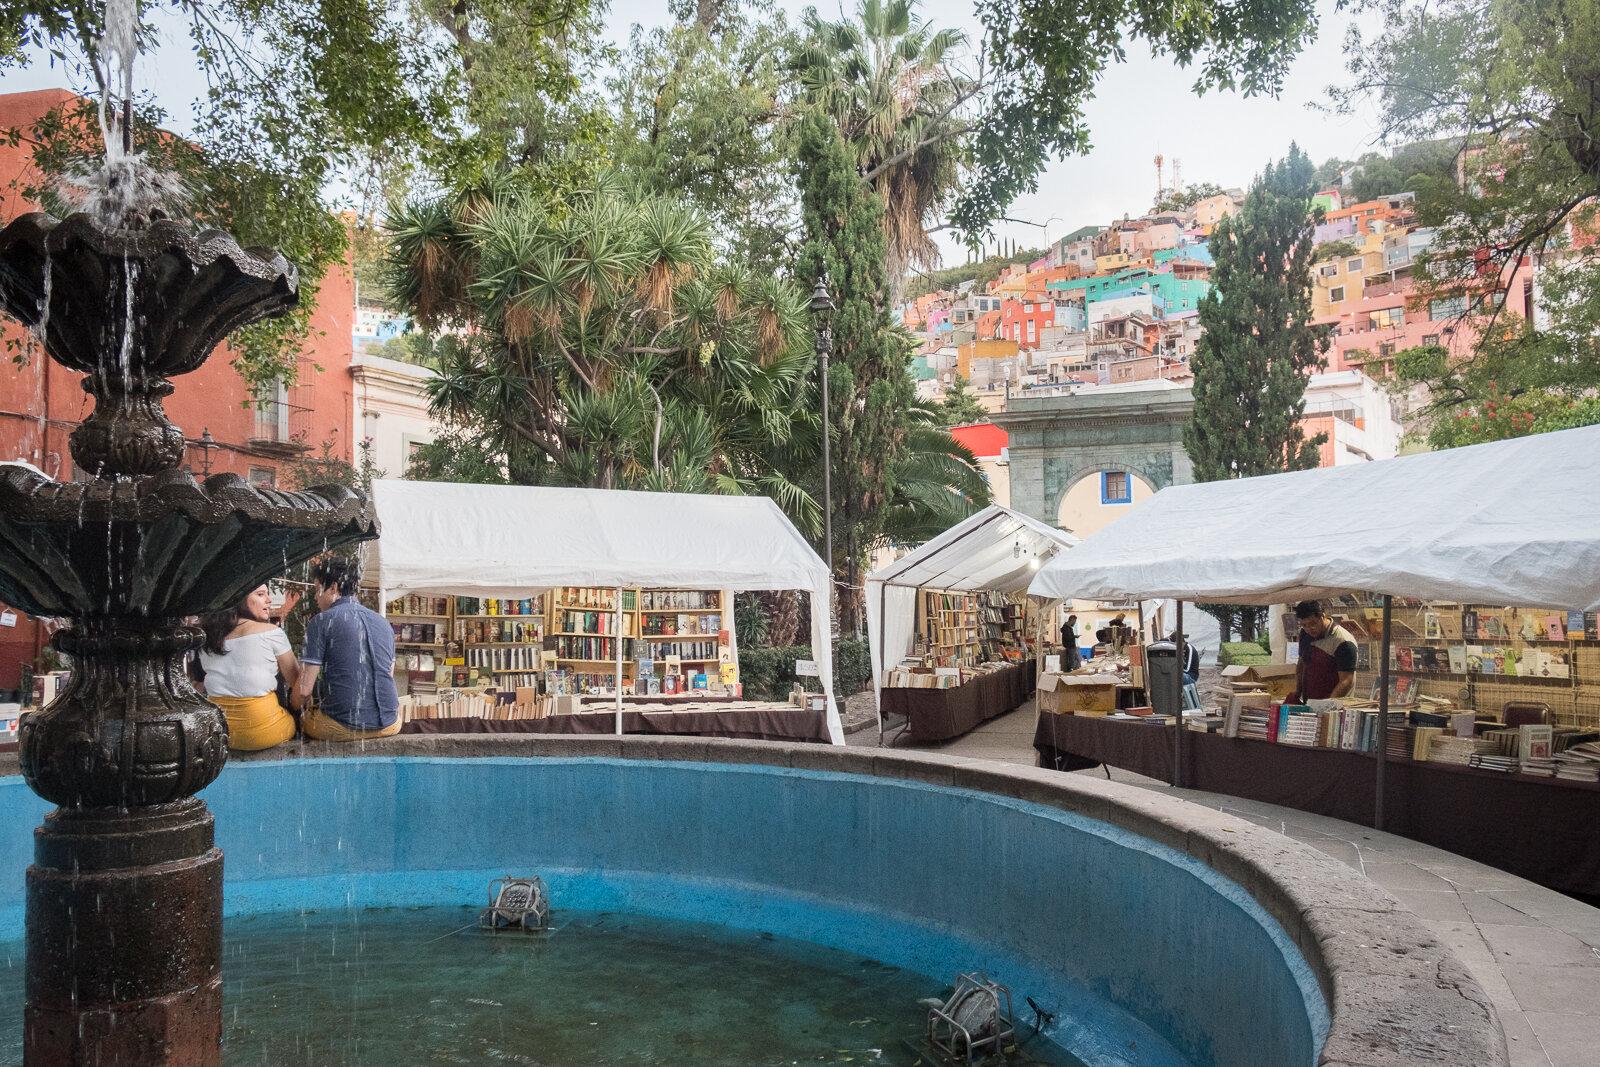 2019.10.8_Mexico_Guanajuato17_Britt first year.jpg